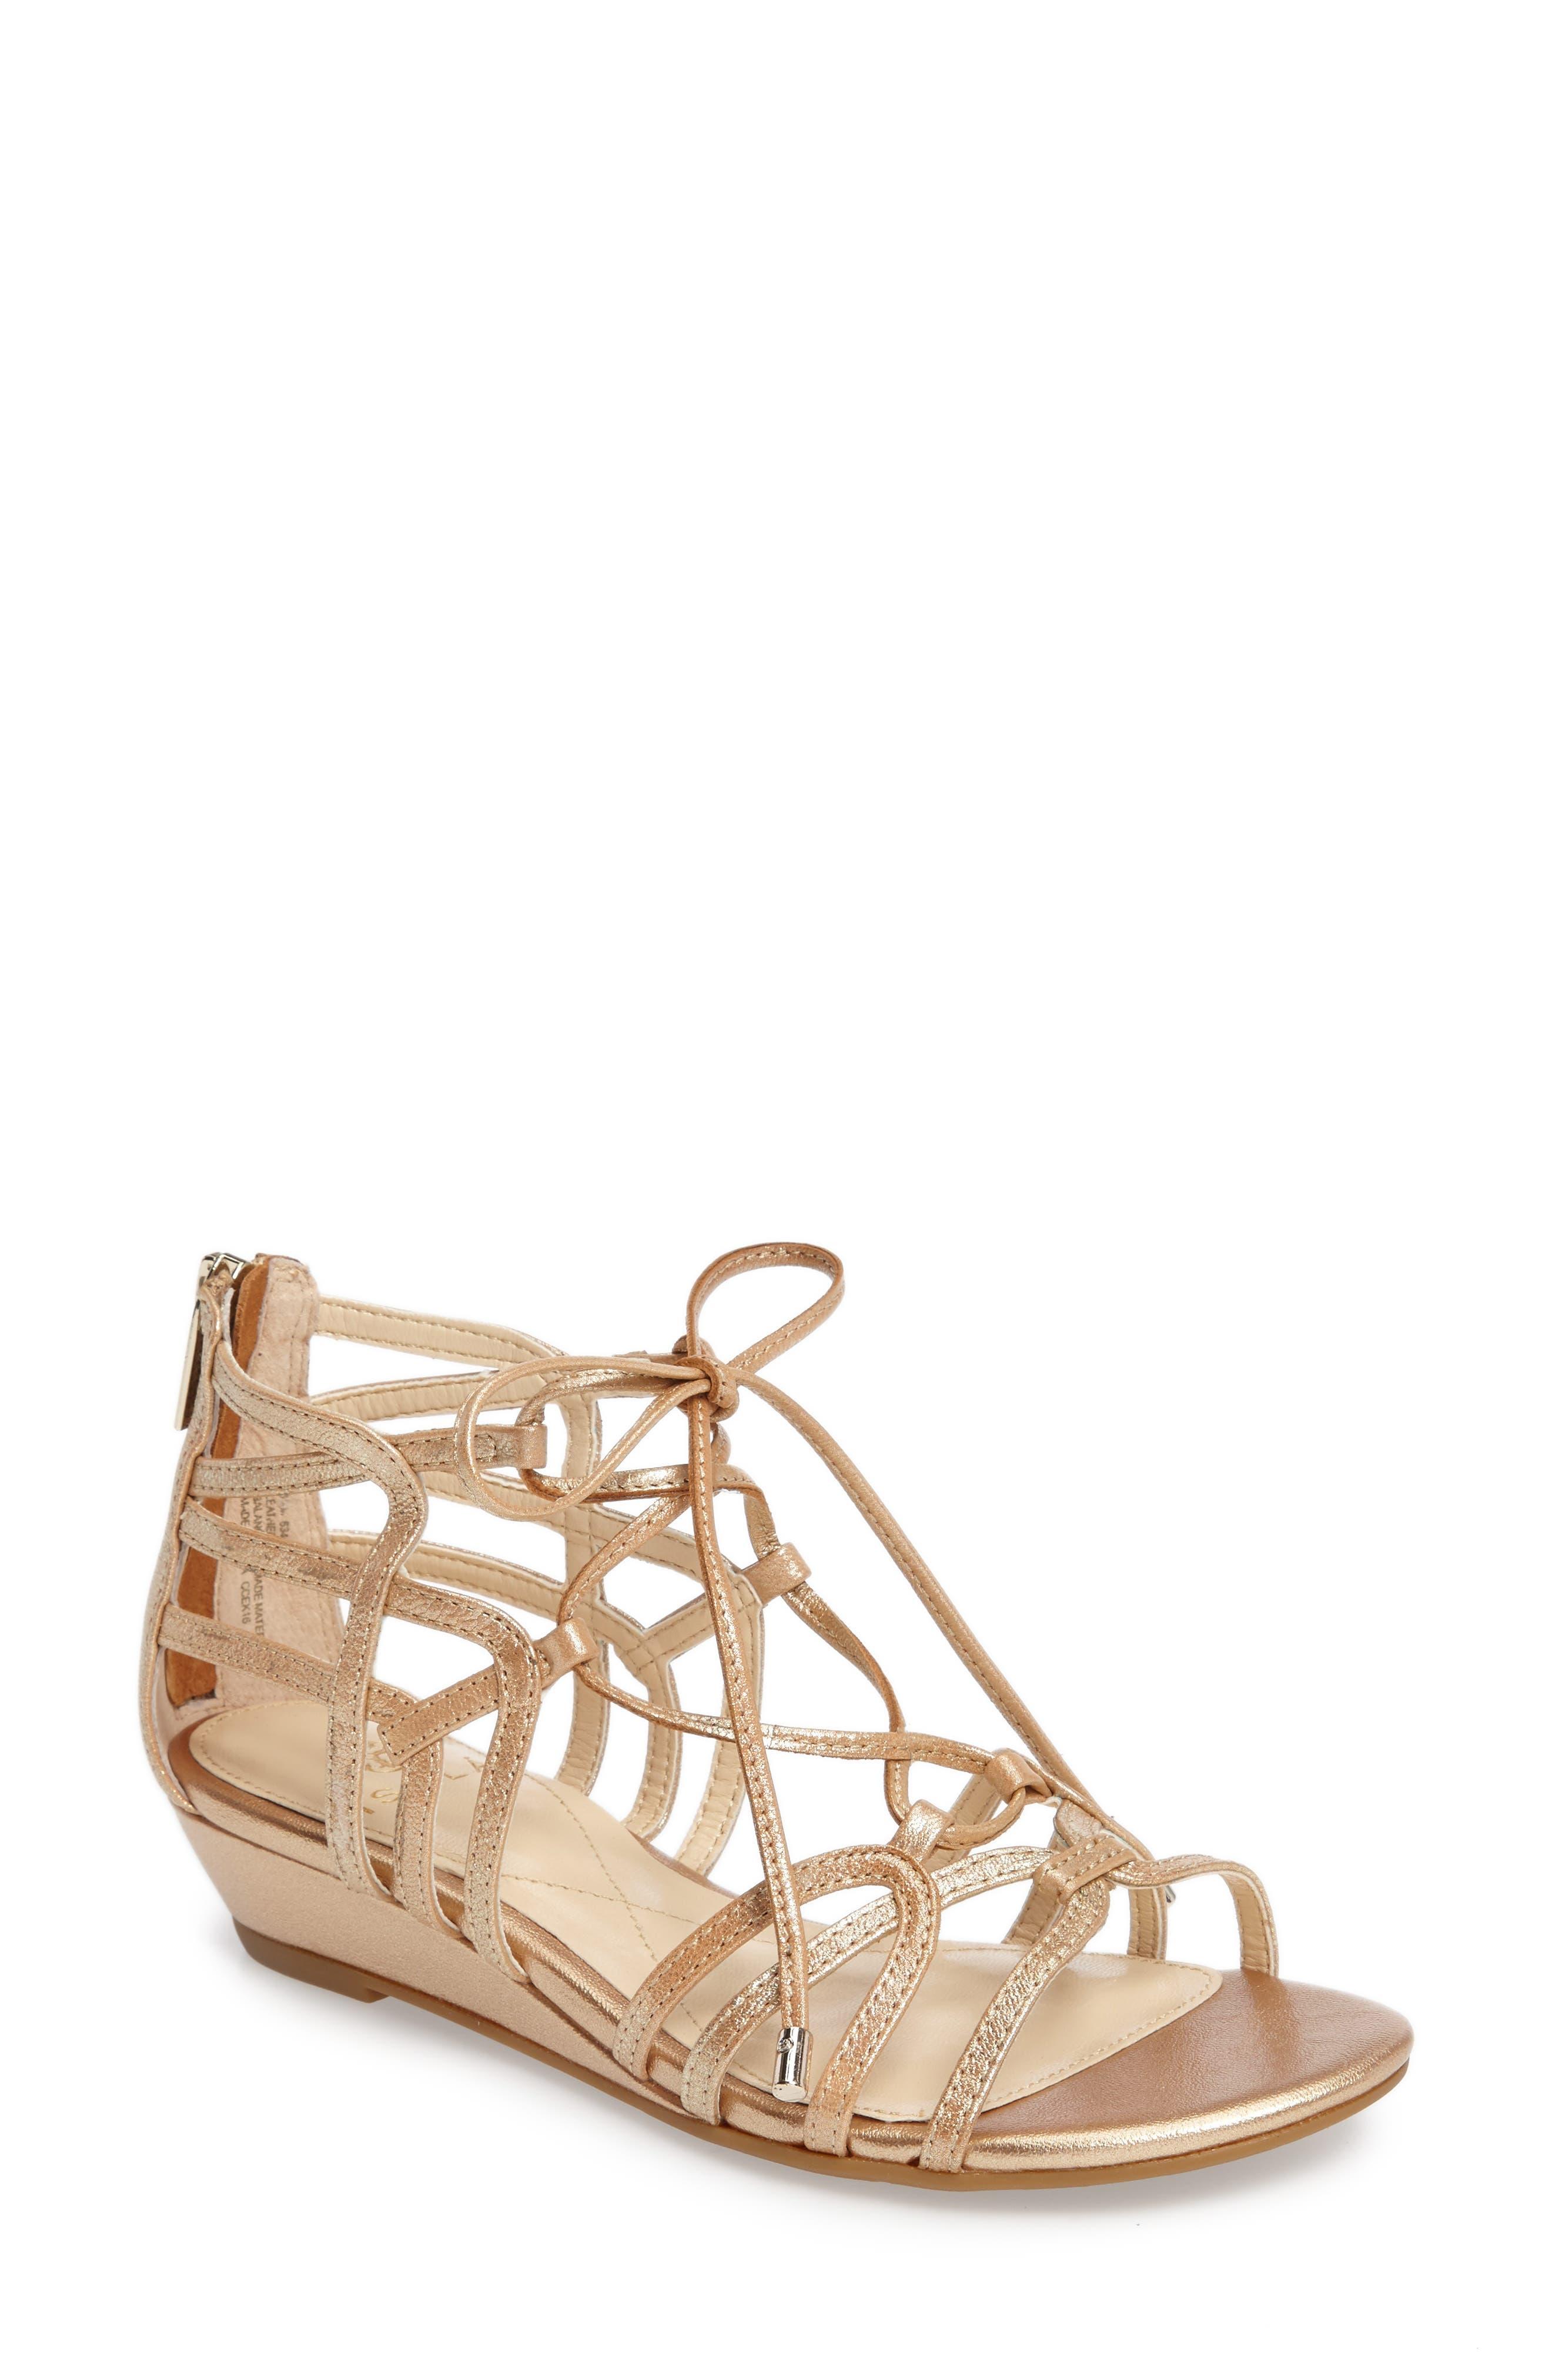 Elisia Lace-Up Sandal,                             Main thumbnail 1, color,                             Gold Leather